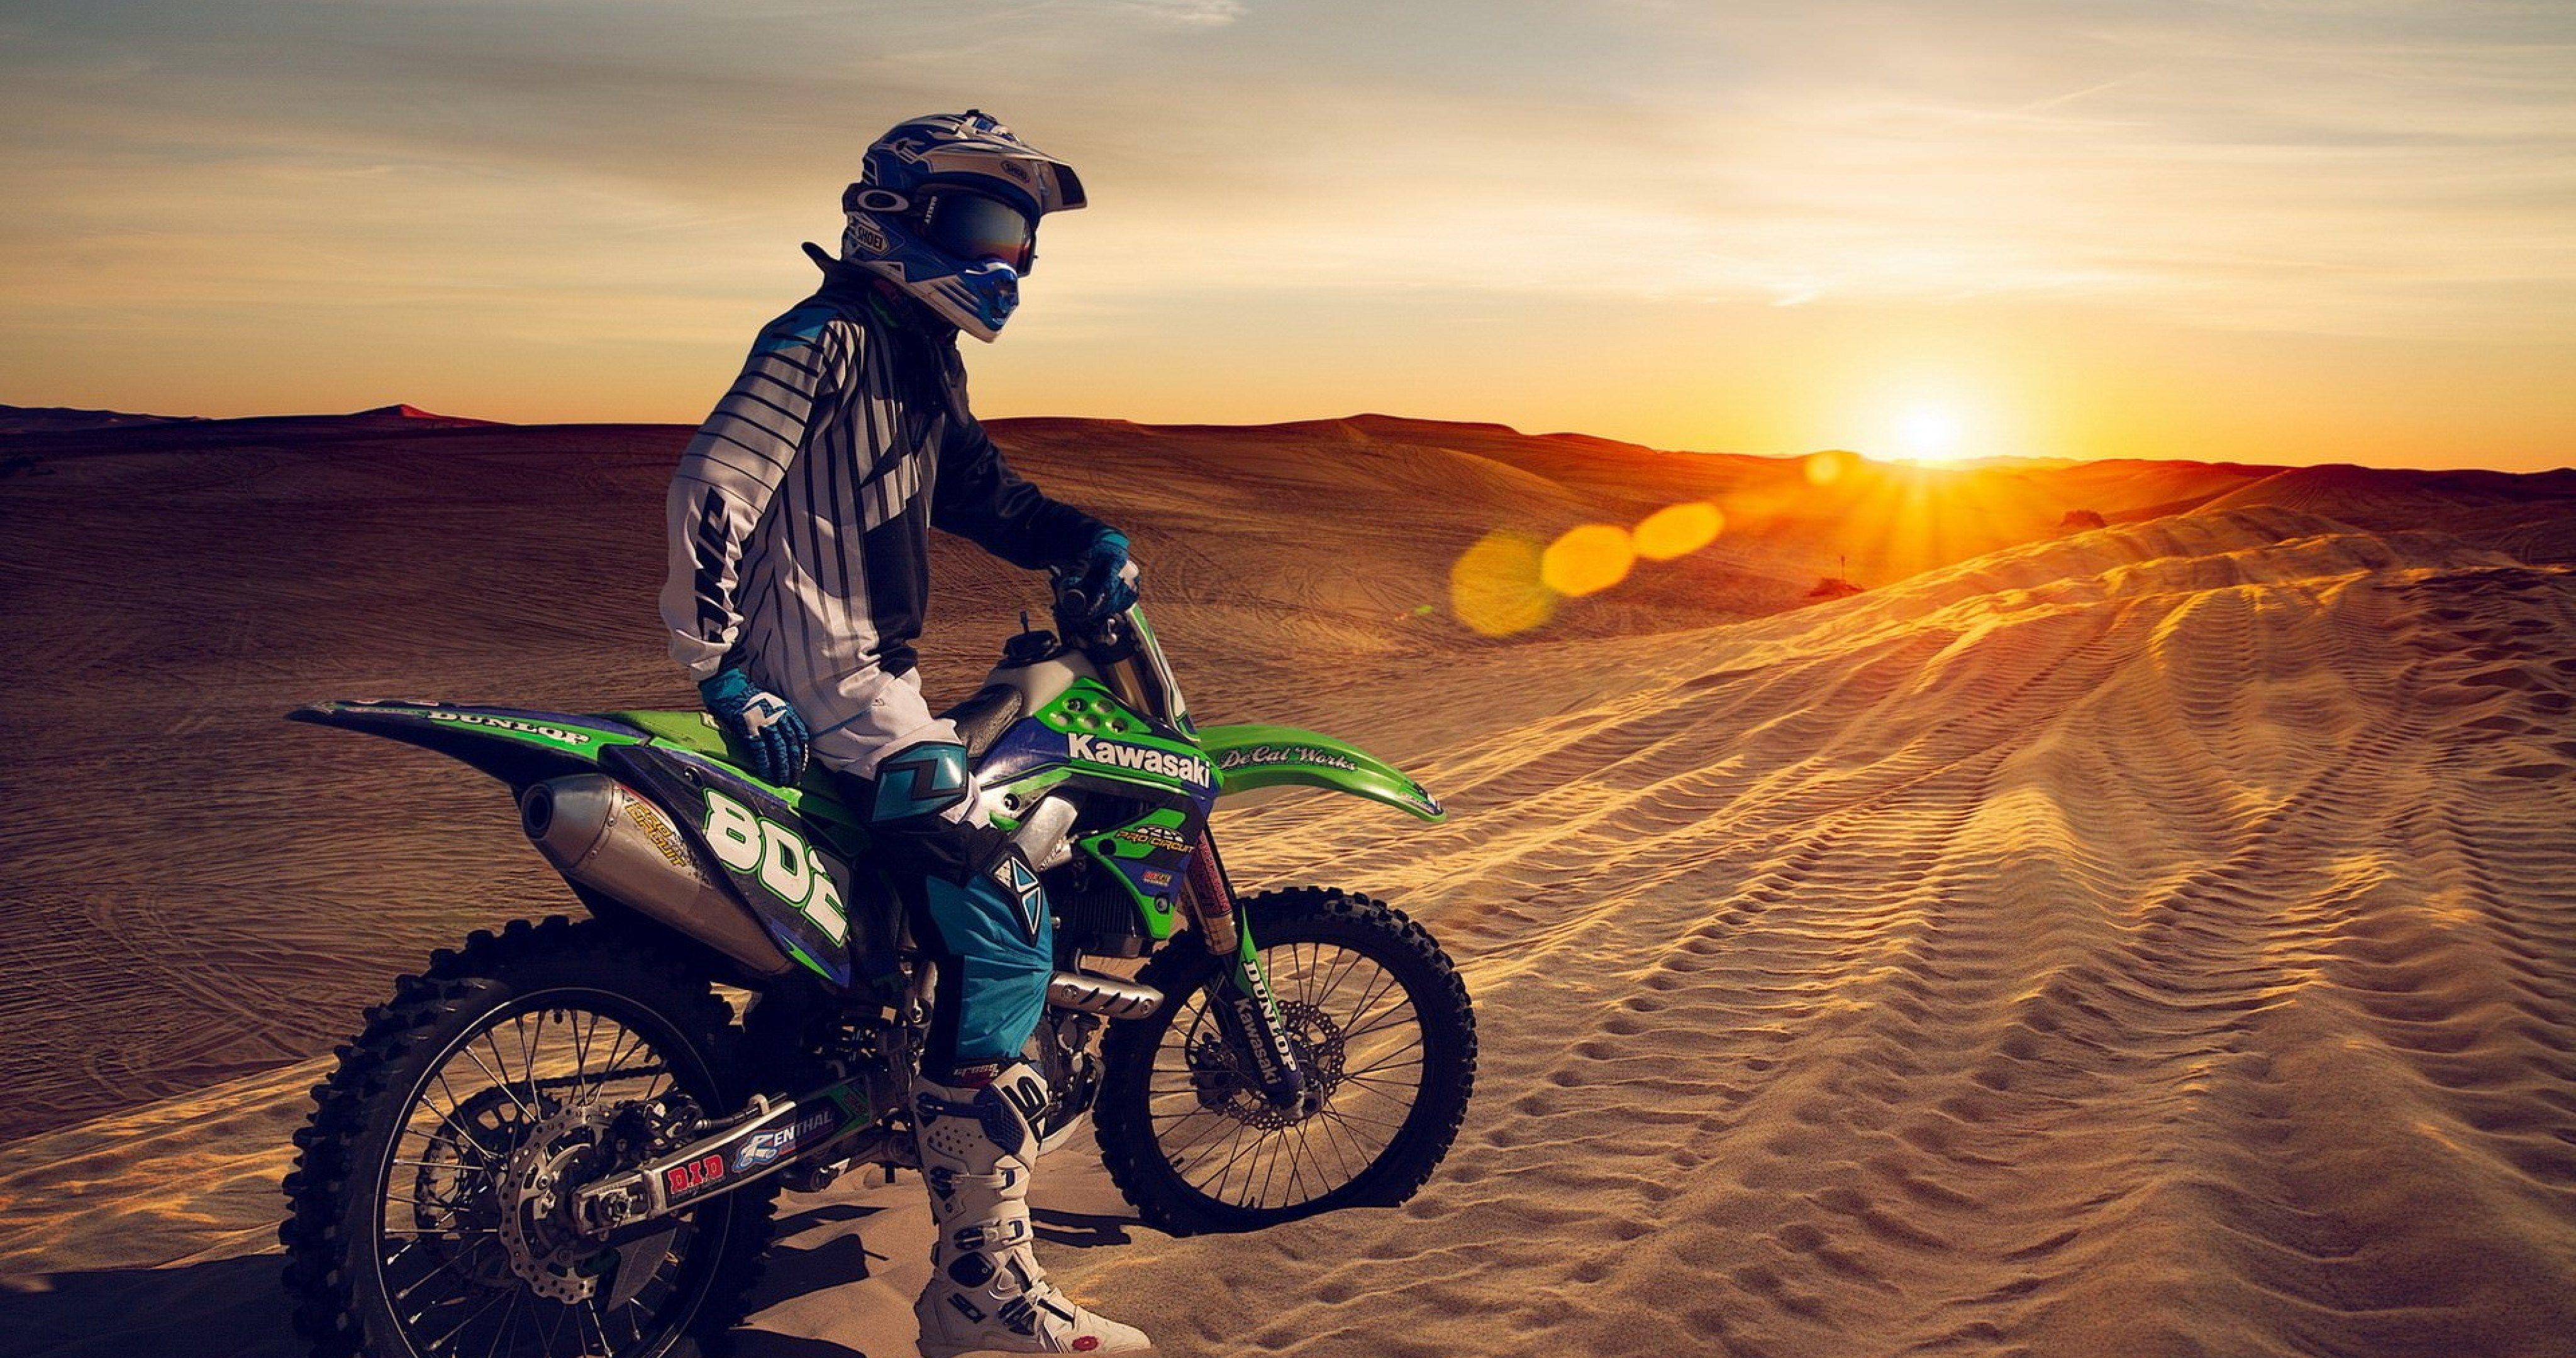 Motorcycle In Sand 4k Ultra Hd Wallpaper Enduro Motocross